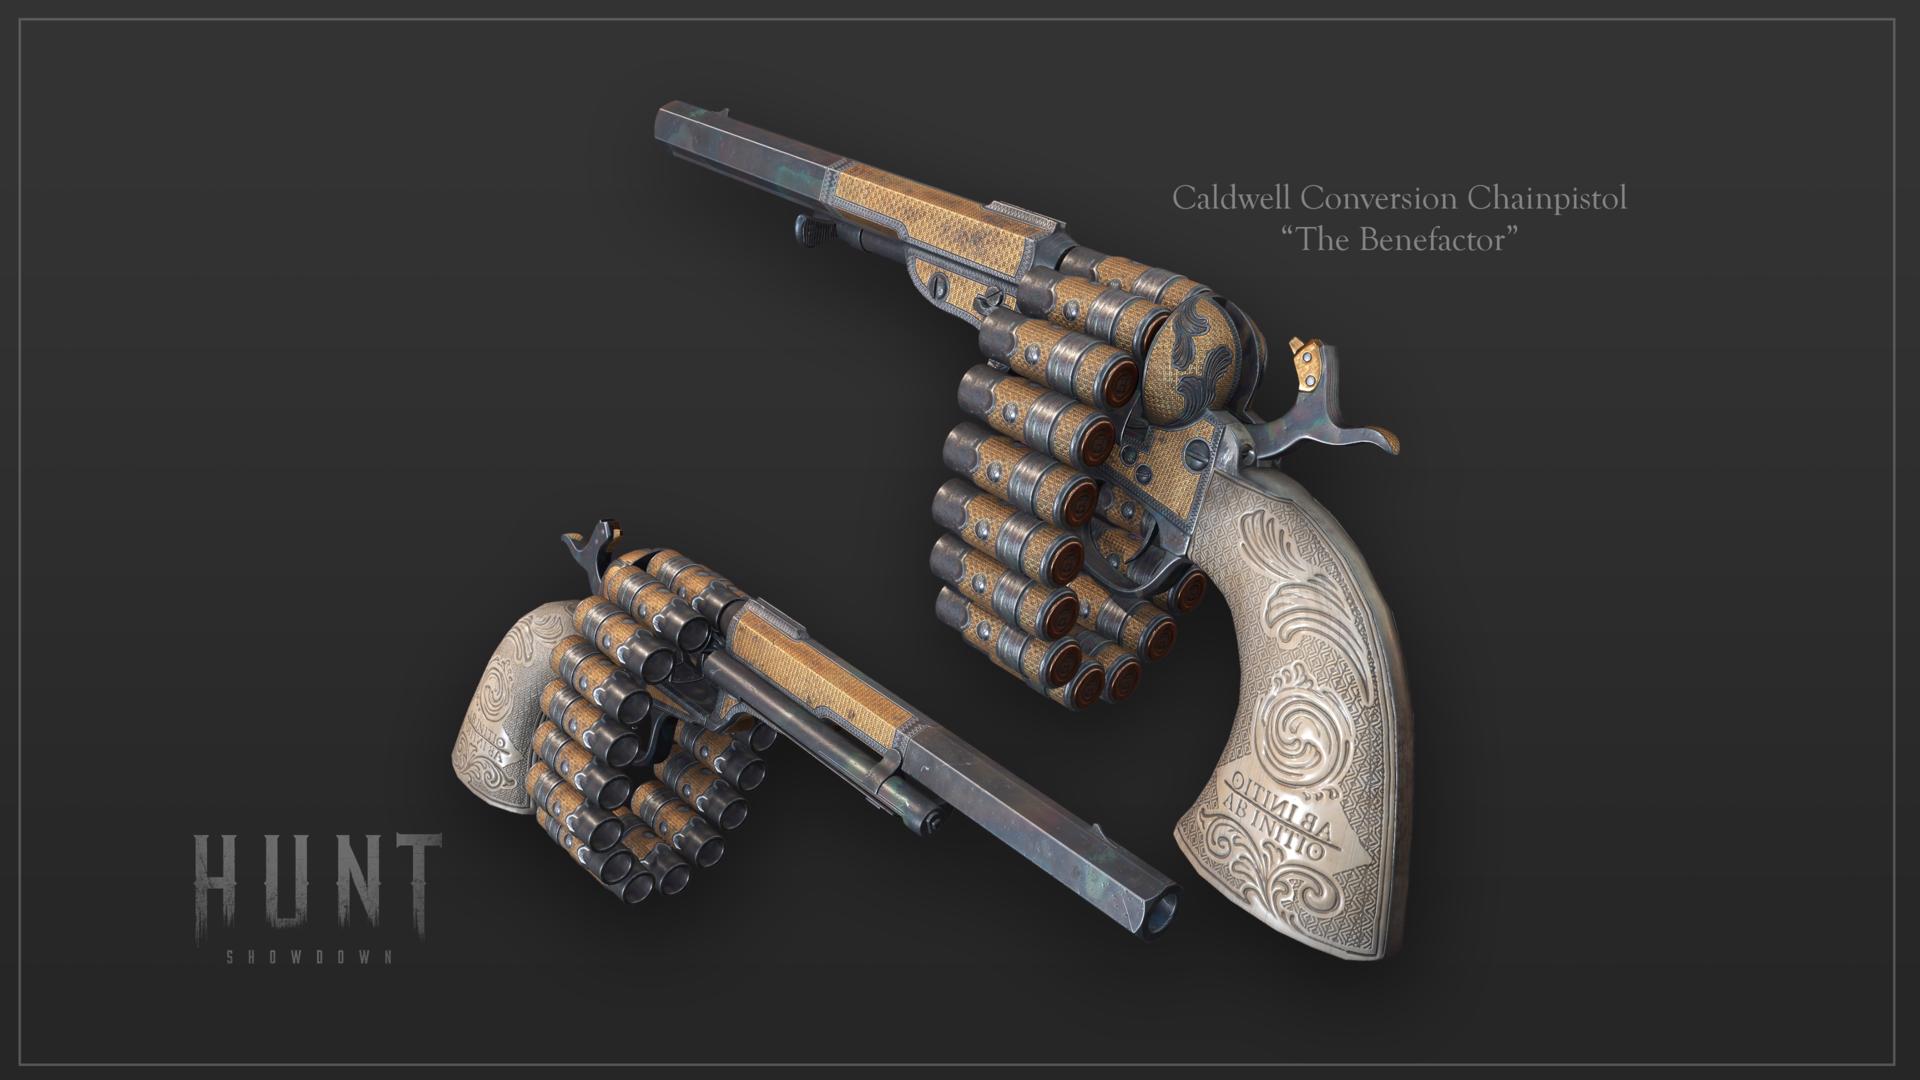 09_bonus_weapon.thumb.png.9a6b7dcf04d18c2f6a0f5a1237237815.png